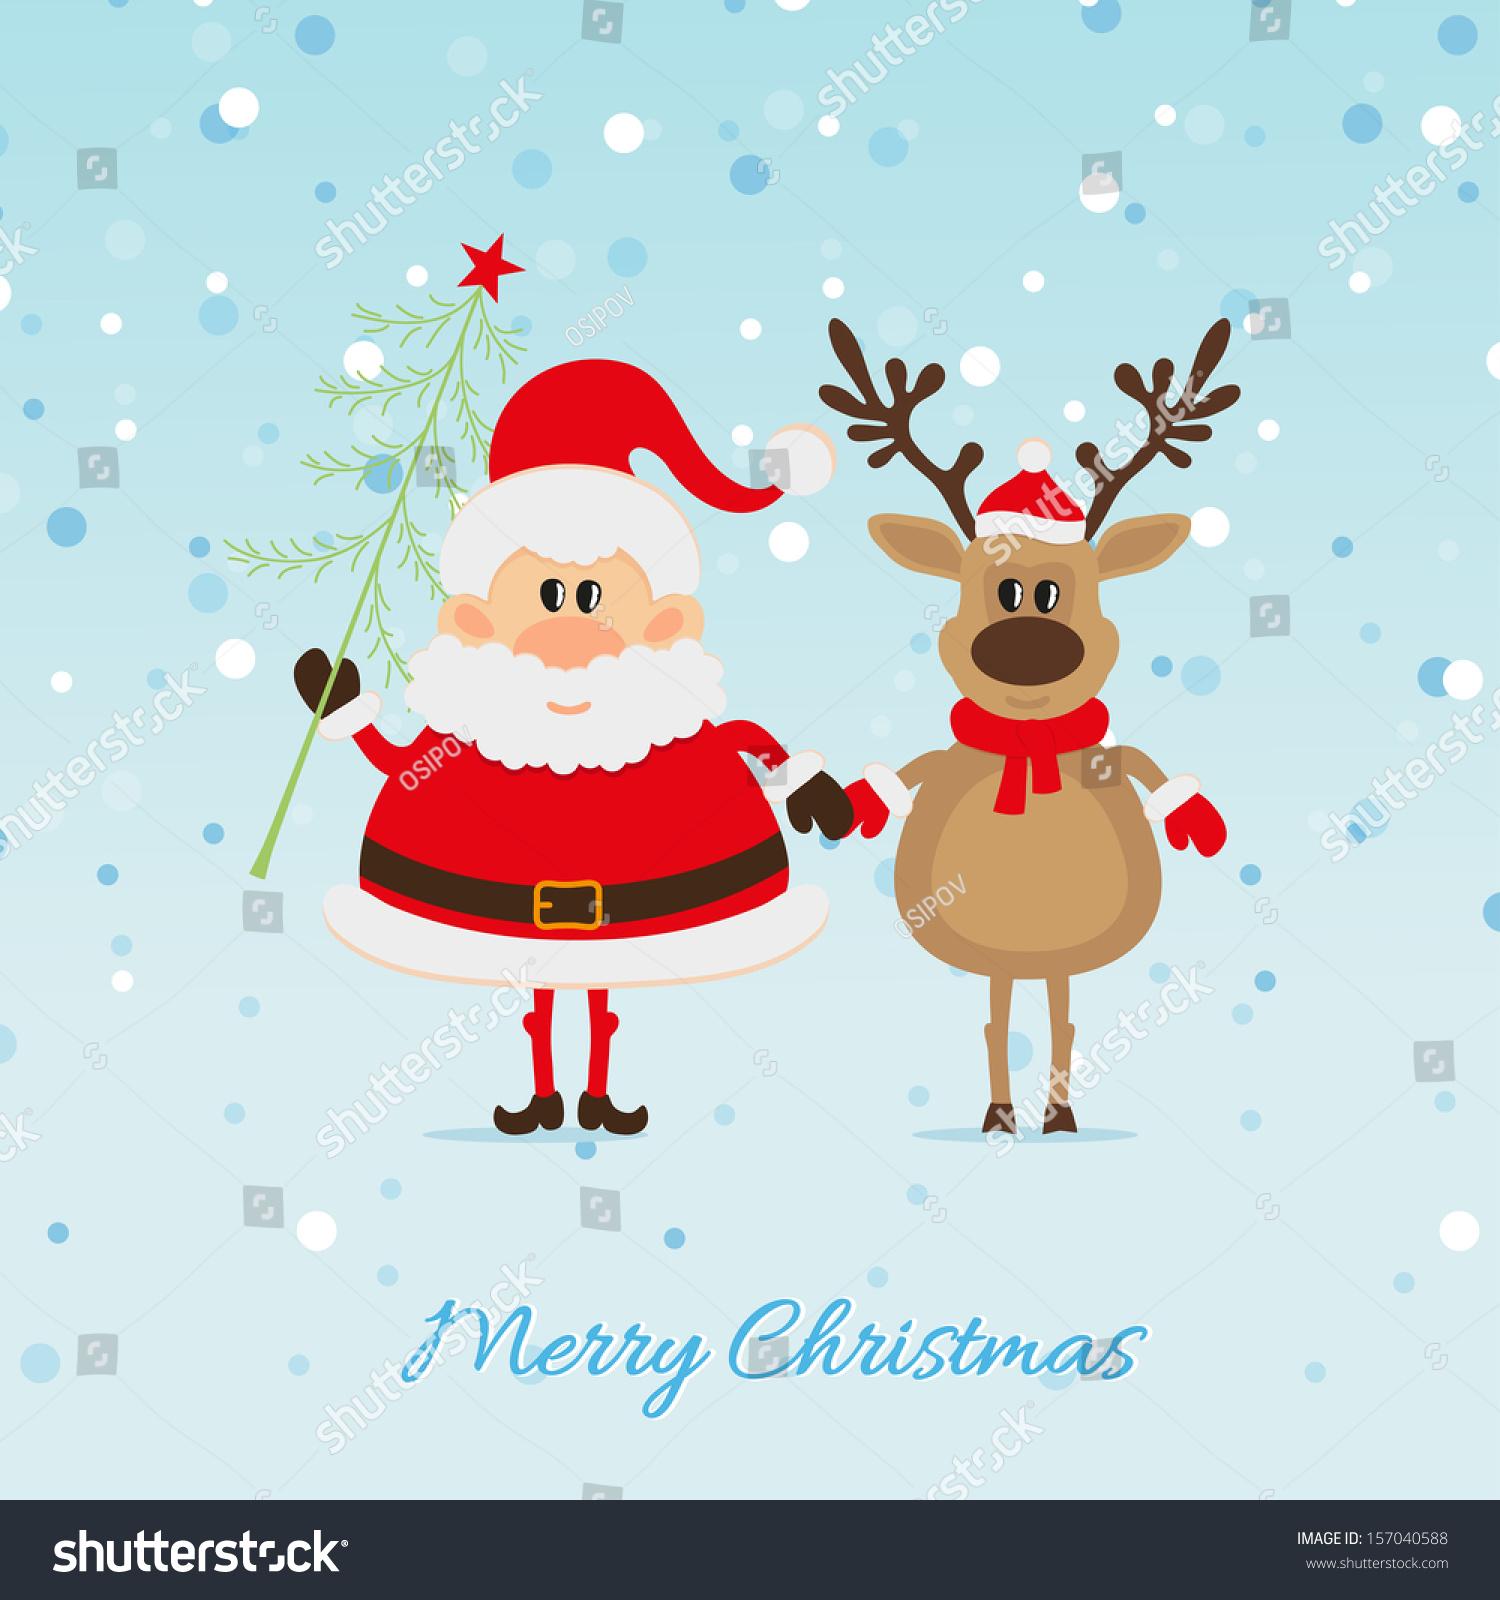 Santa Claus Christmas Tree Reindeer Christmas Stock Vector ...